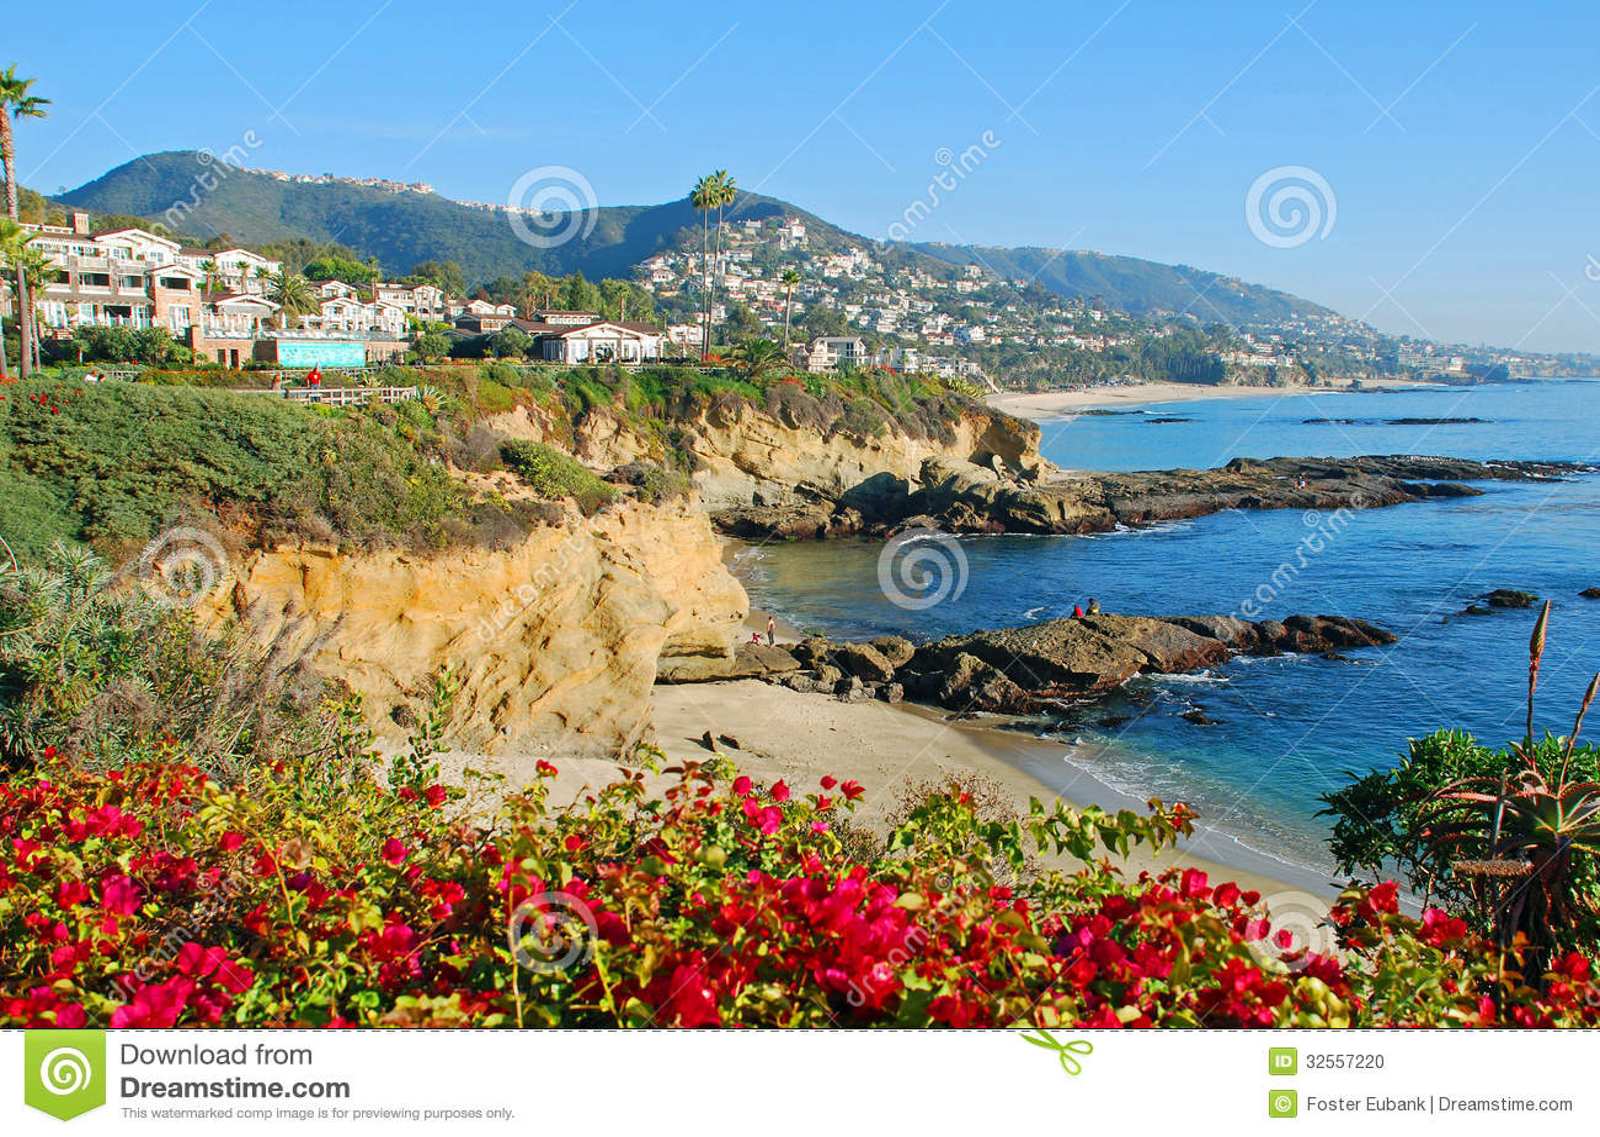 Image Result For Montage Resort Laguna Beach